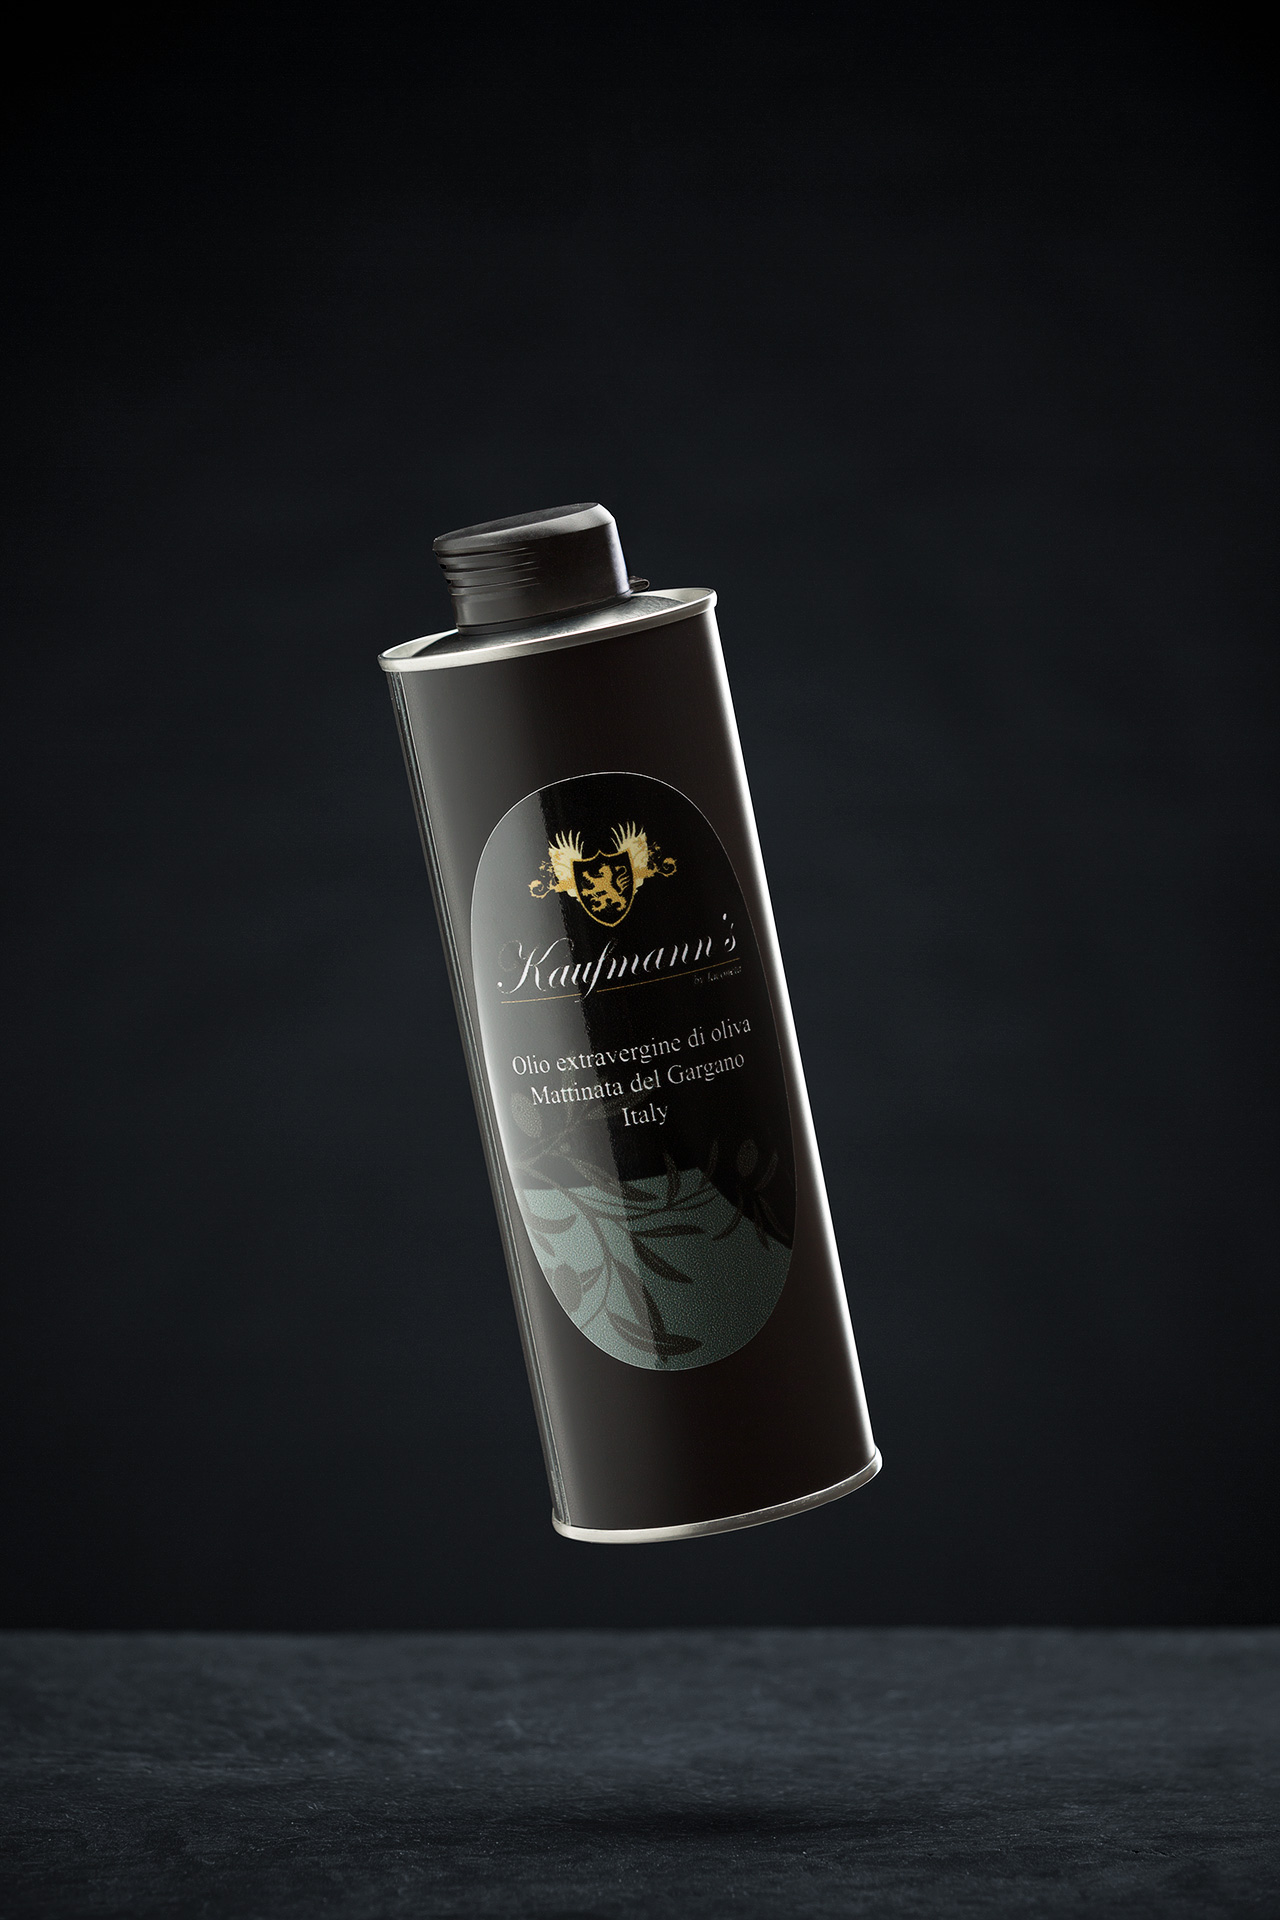 Kaufmann's Olivenöl